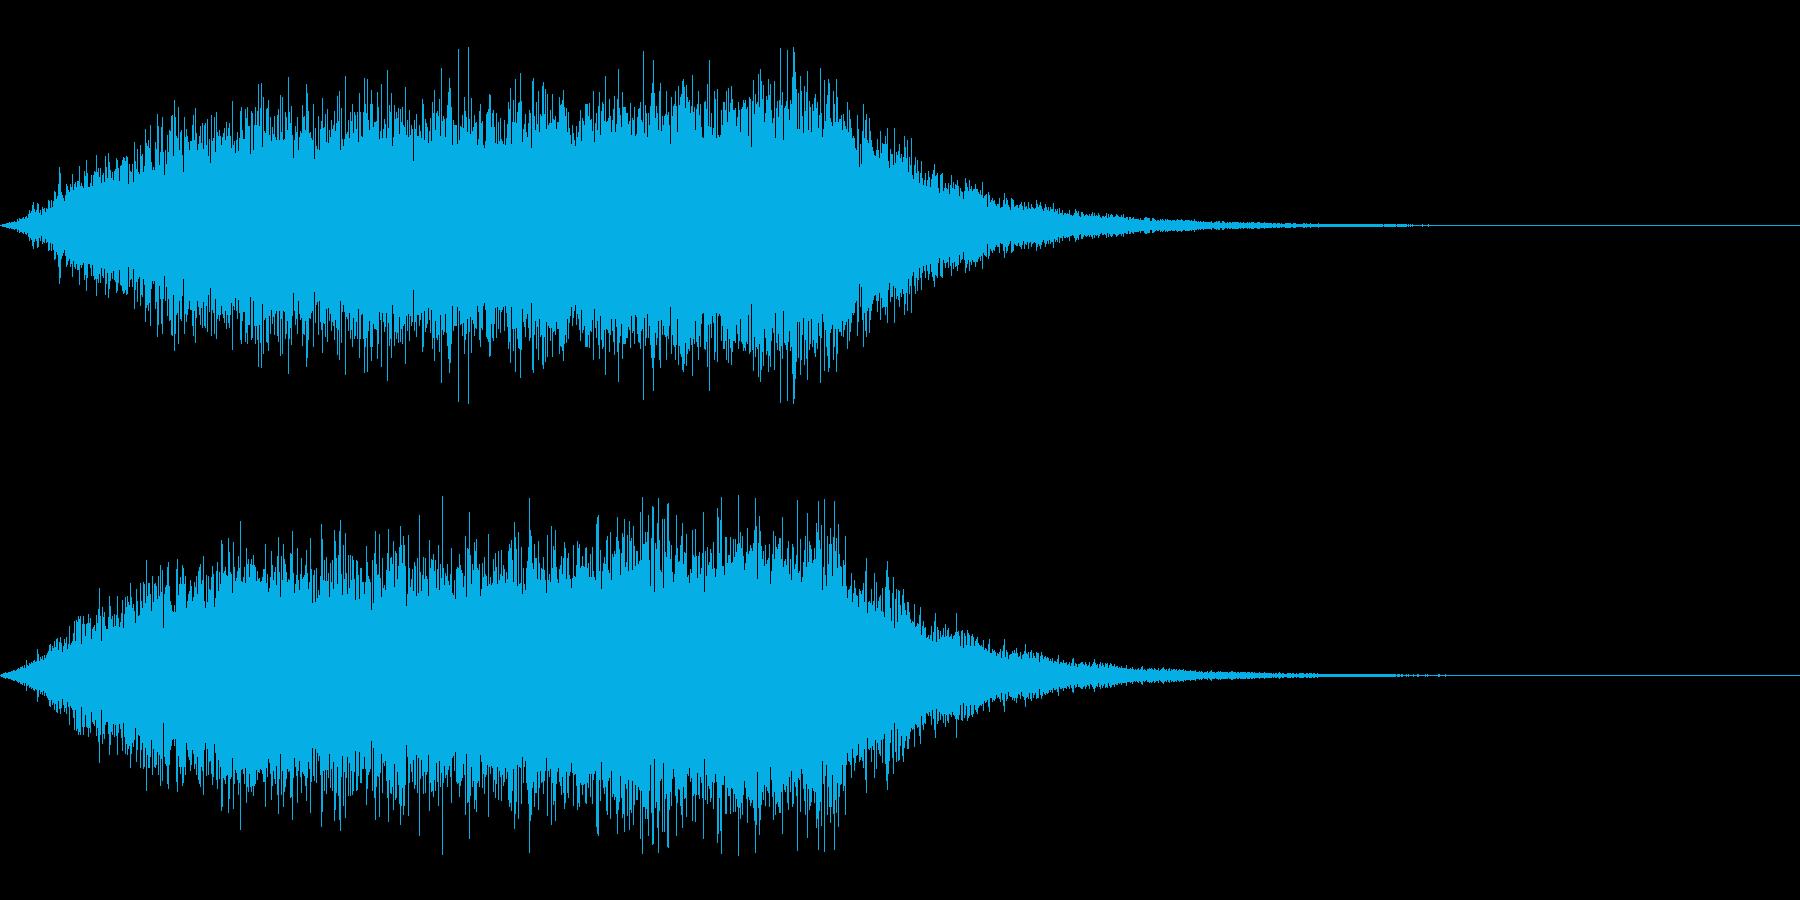 Dark_SweepUp-07Delayの再生済みの波形